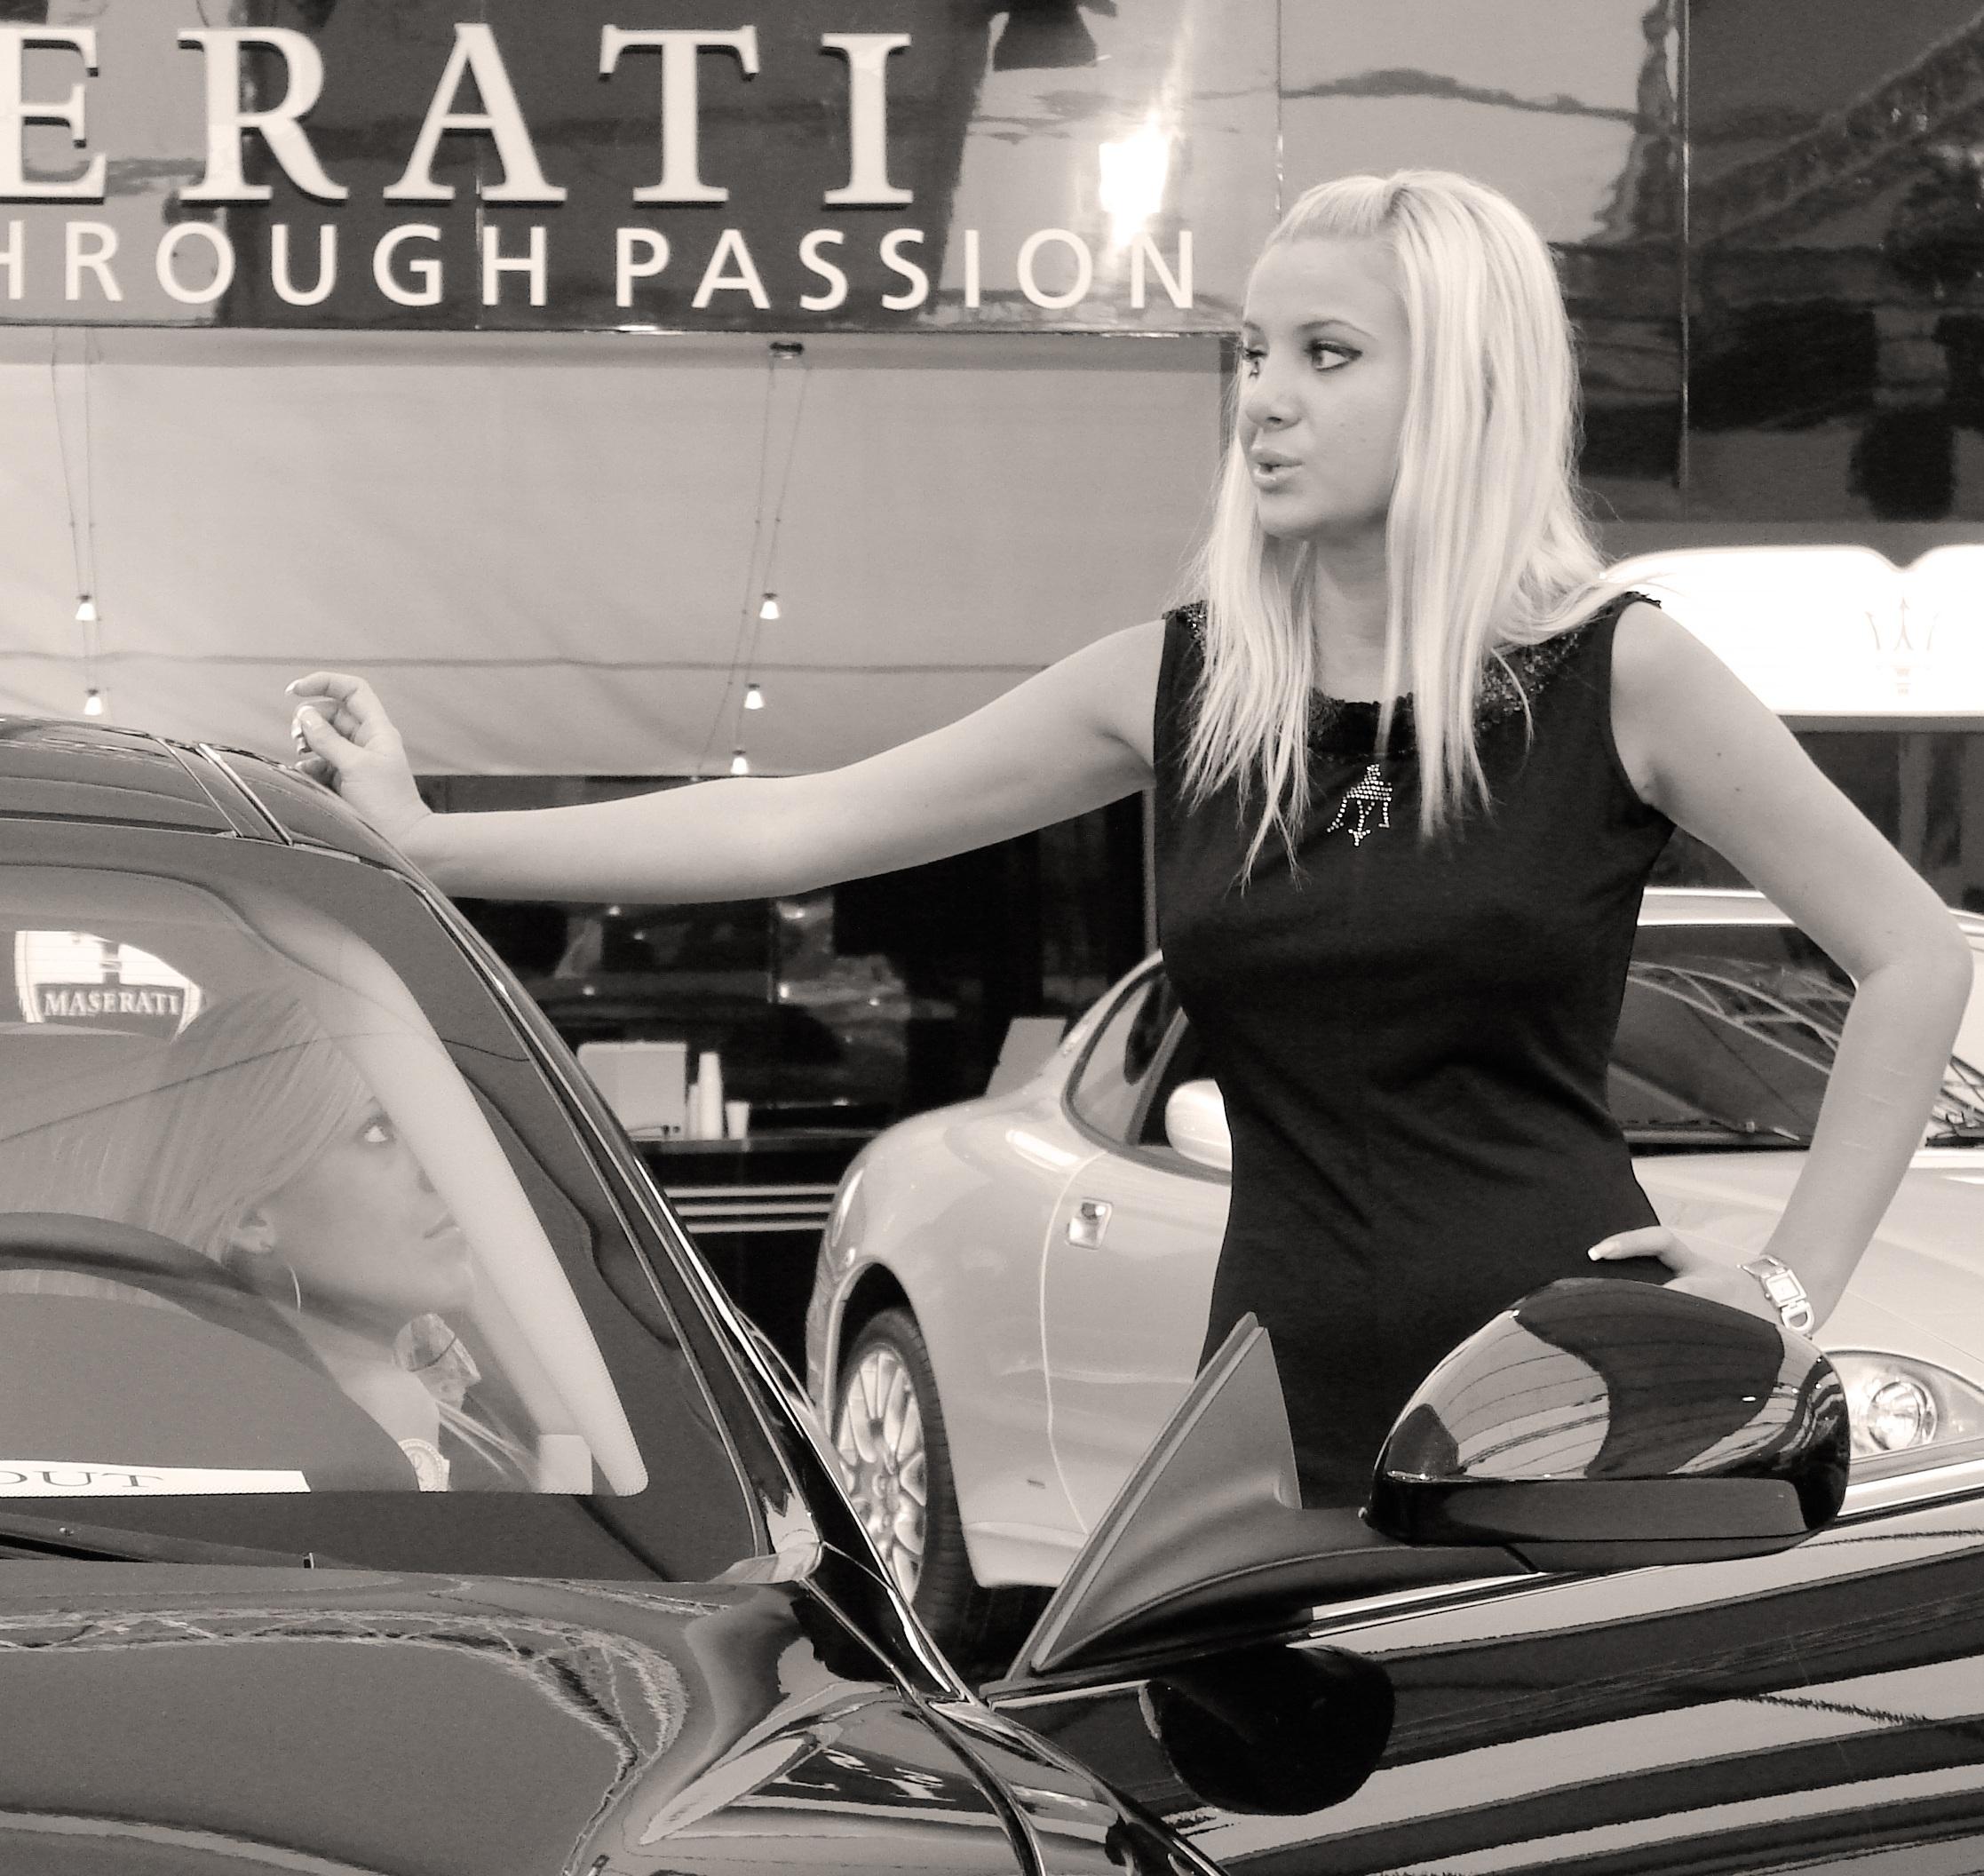 Free Images Black And White Woman Model Vehicle Italy Machinery Fashion Sports Car Luxury Atude Maserati Hostess Auto Show